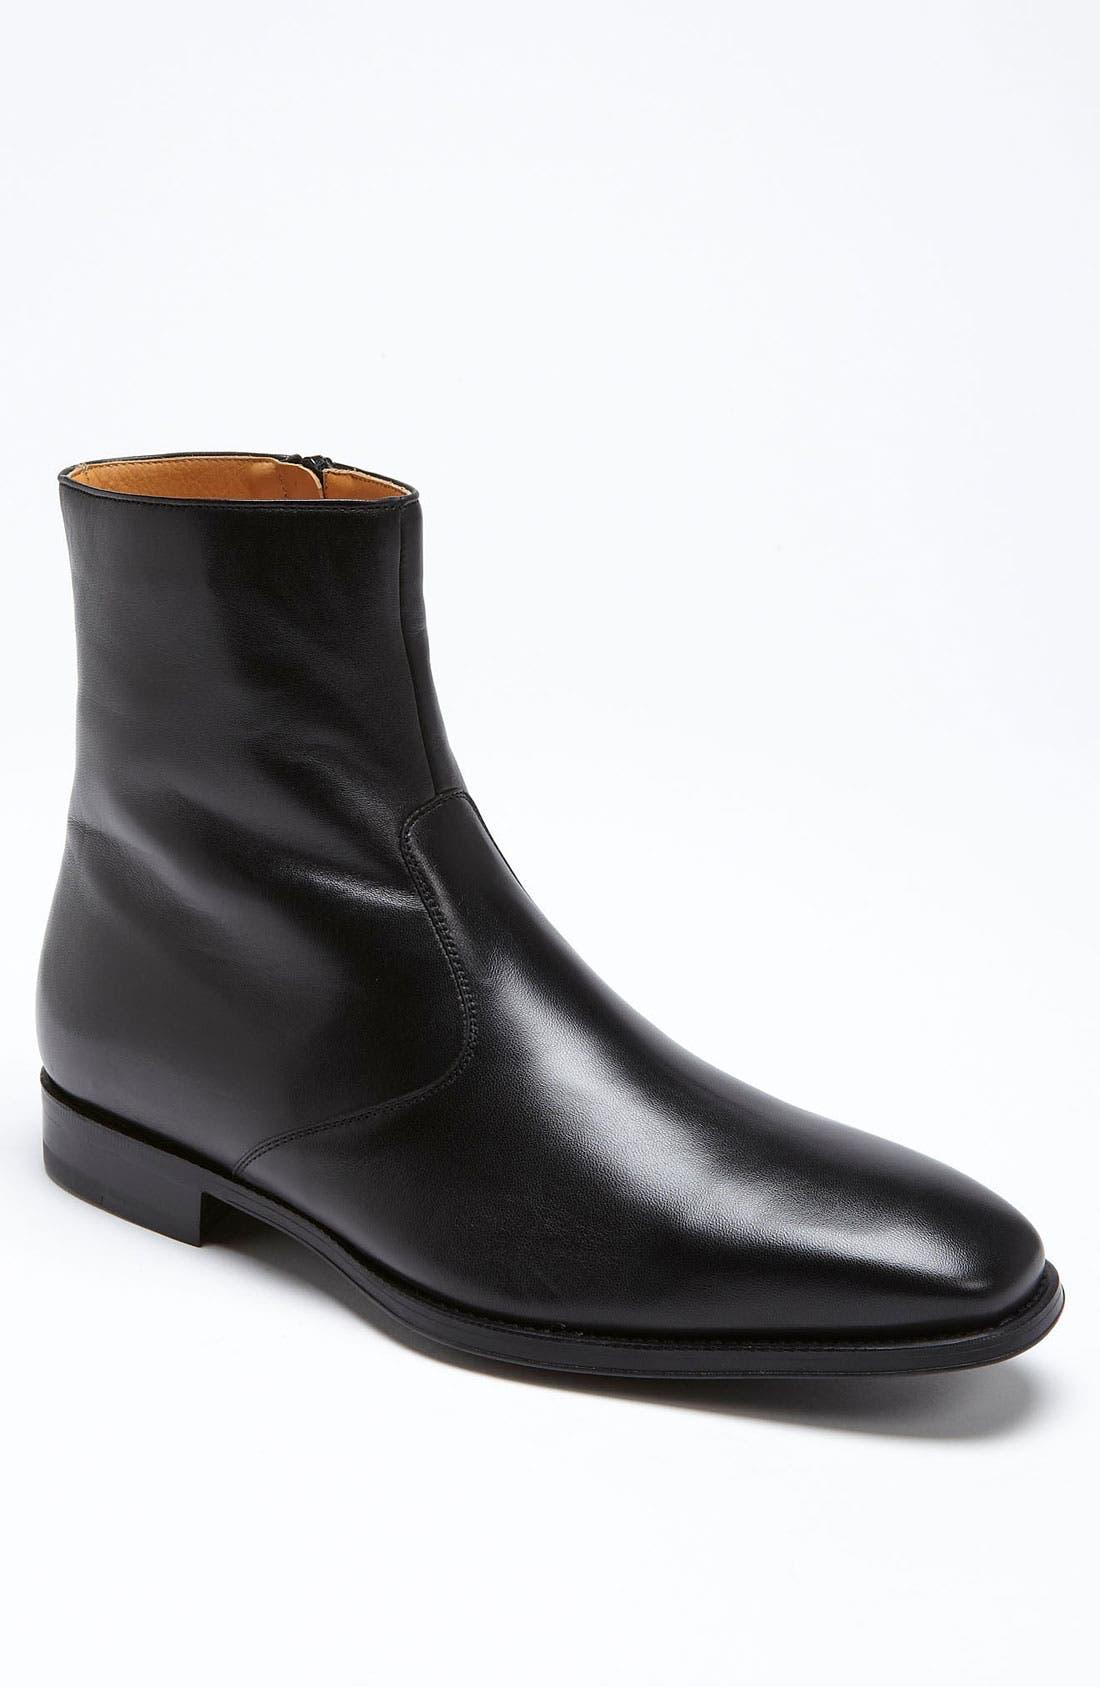 Alternate Image 1 Selected - Magnanni Donosti Zip Boot (Men)